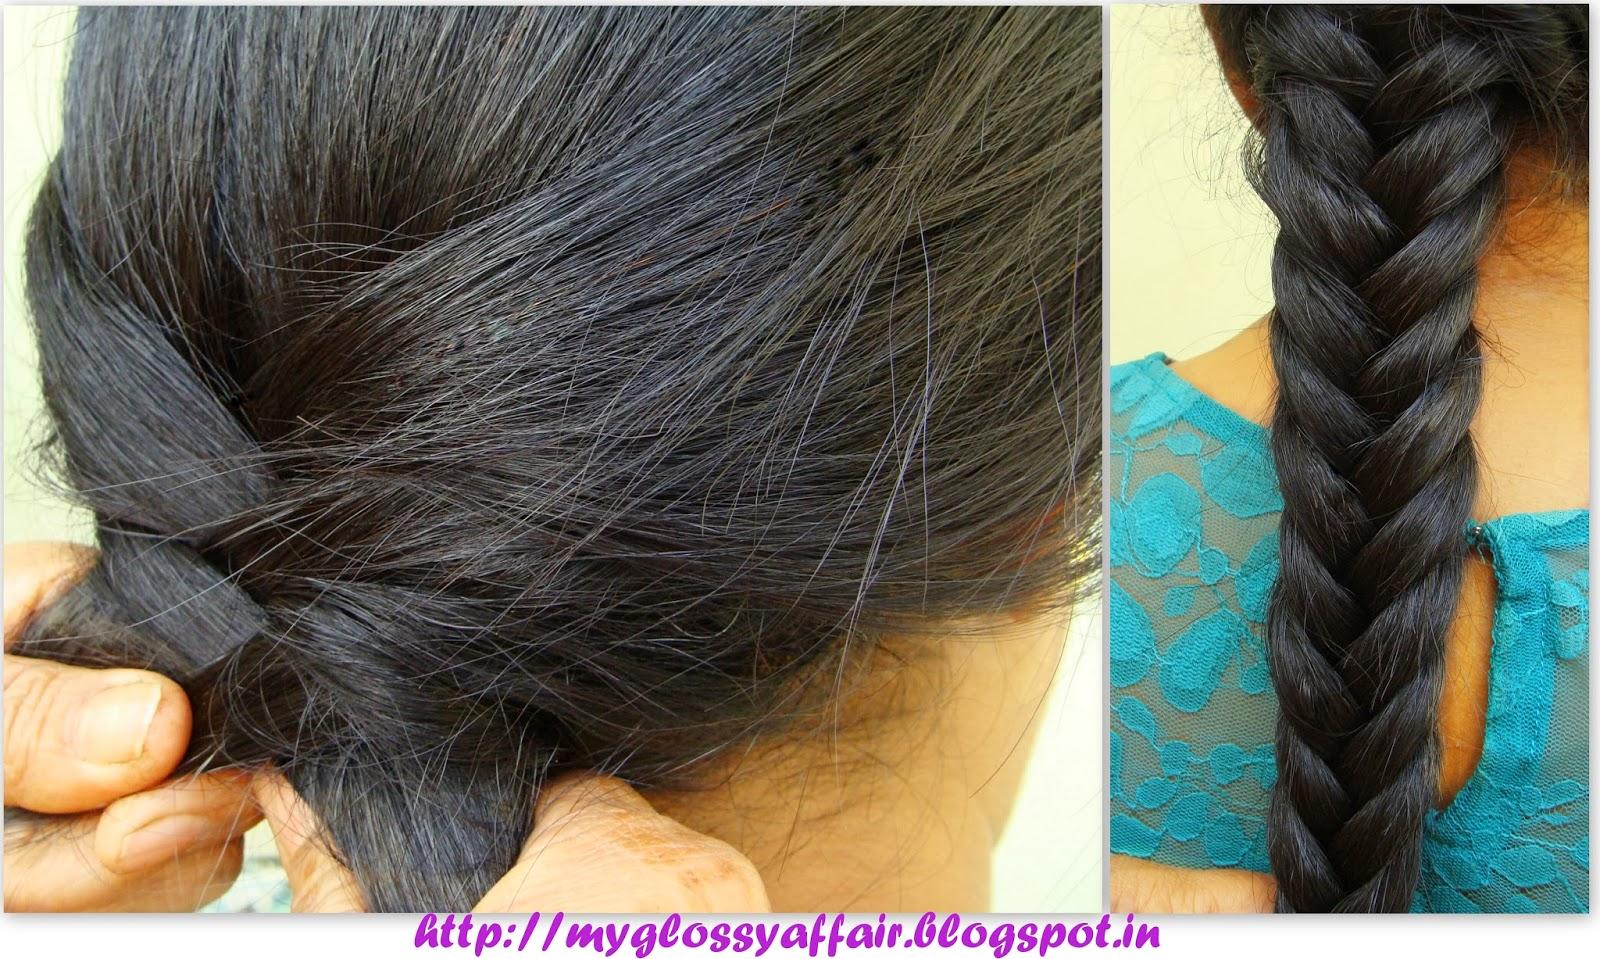 Hairstyles Braids Easy Tutorial: Easy To Do Fishtail Braid